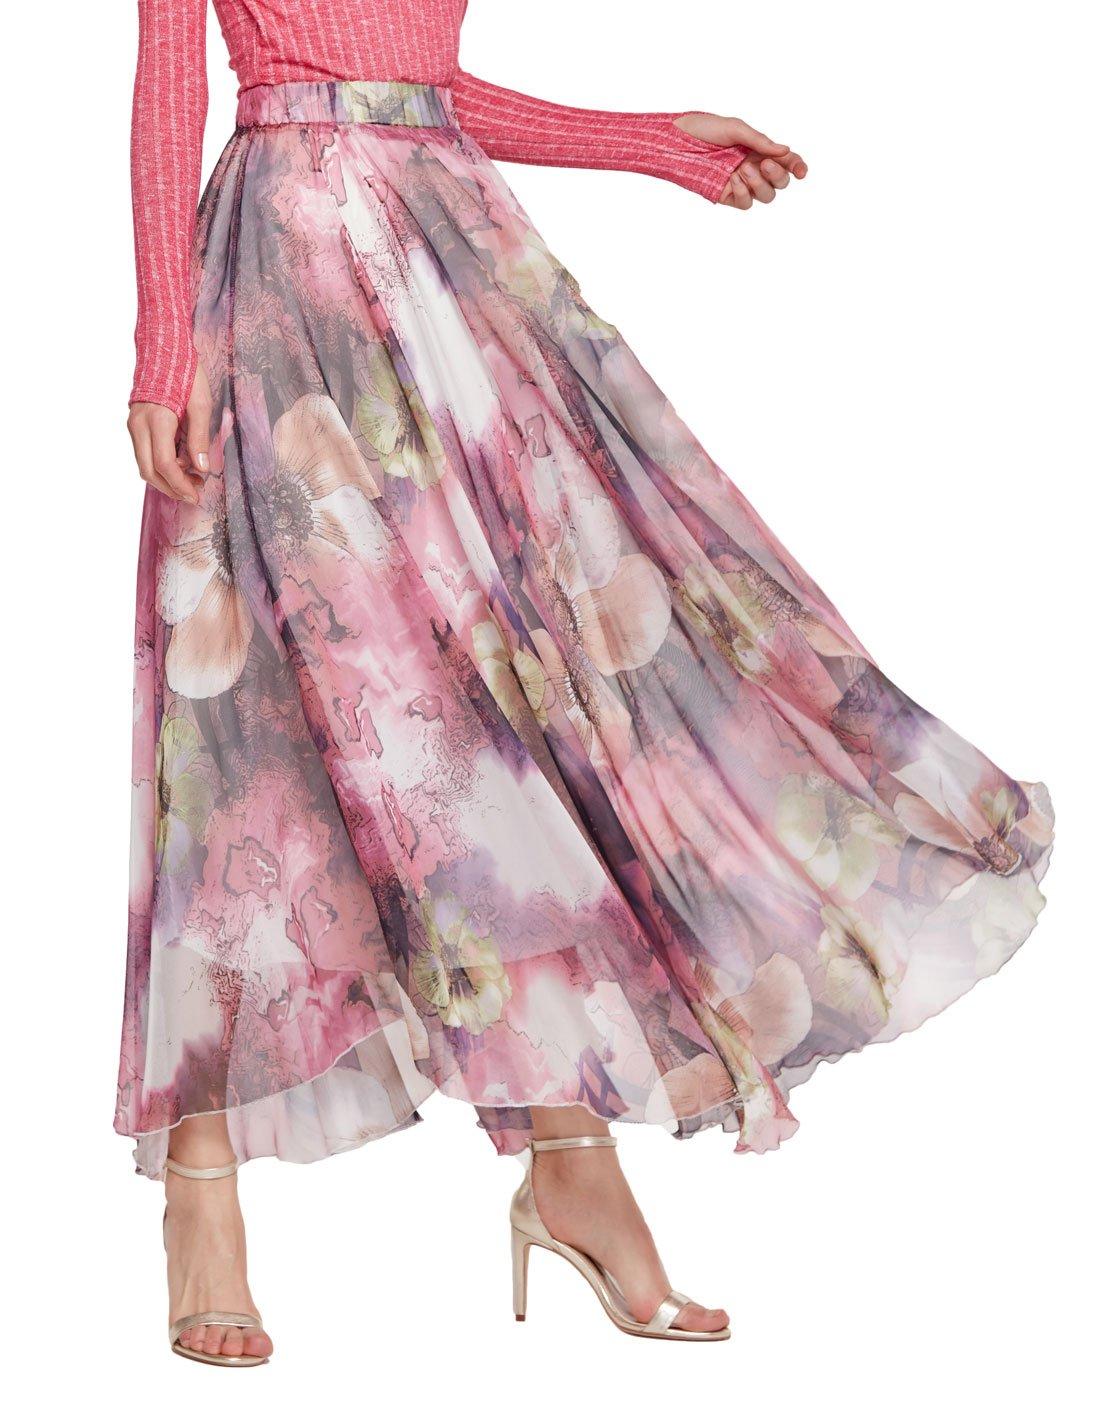 Chartou Women's Elegant Summer Full Length Boho Floral Print Pleated Chiffon Long Maxi Skirt Dress (Purple, Medium)